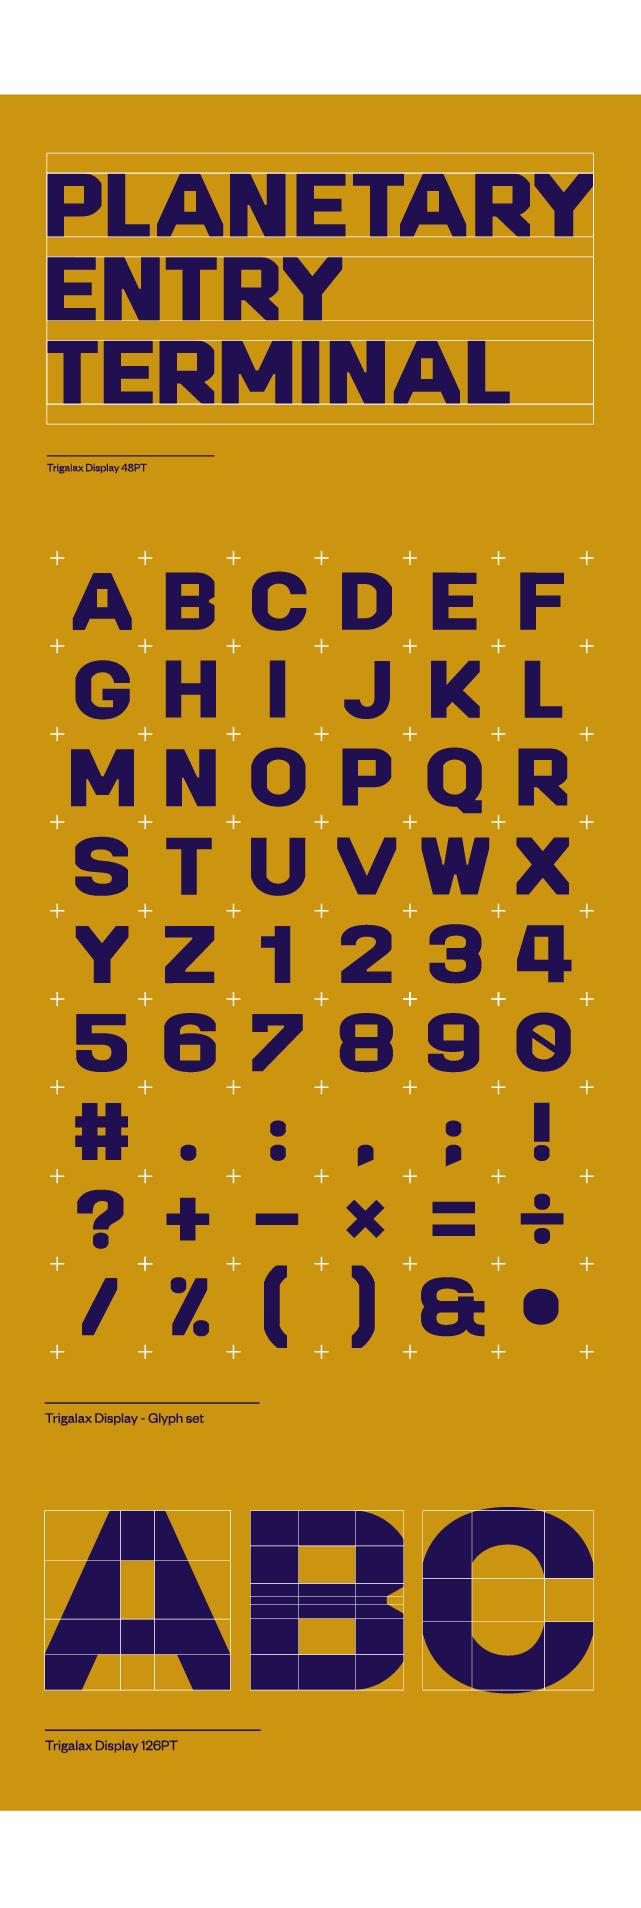 15_Trigalax-Space-Branding-Typeface-Font-Custom-M